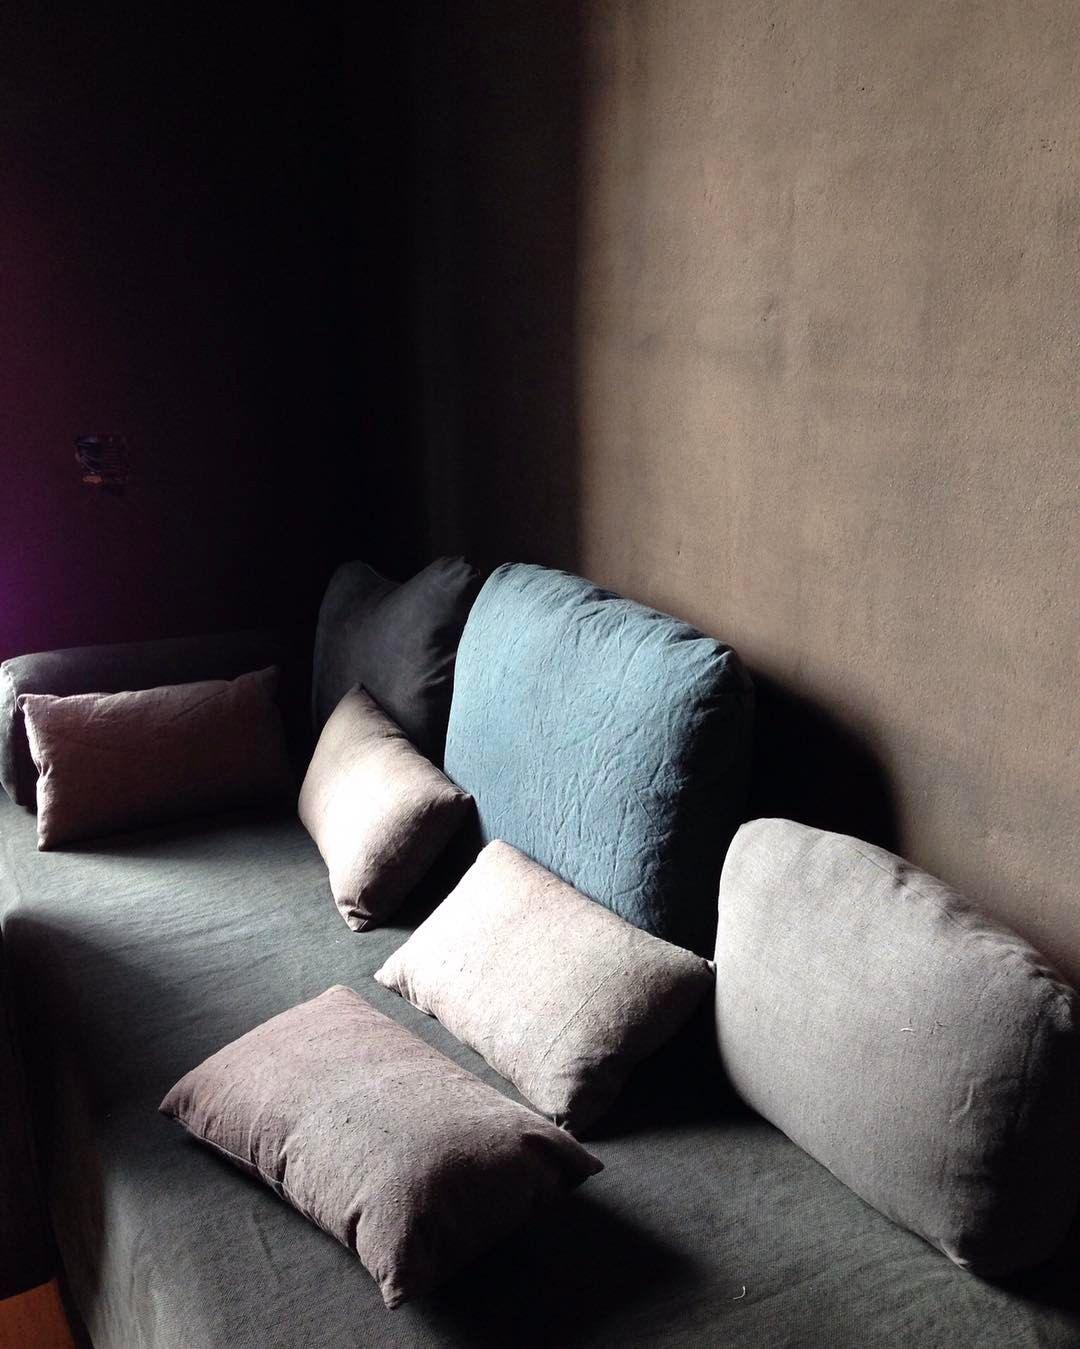 Pin by Chris Wrobleski on Dream Home | Pinterest | Penthouses, Wabi ...